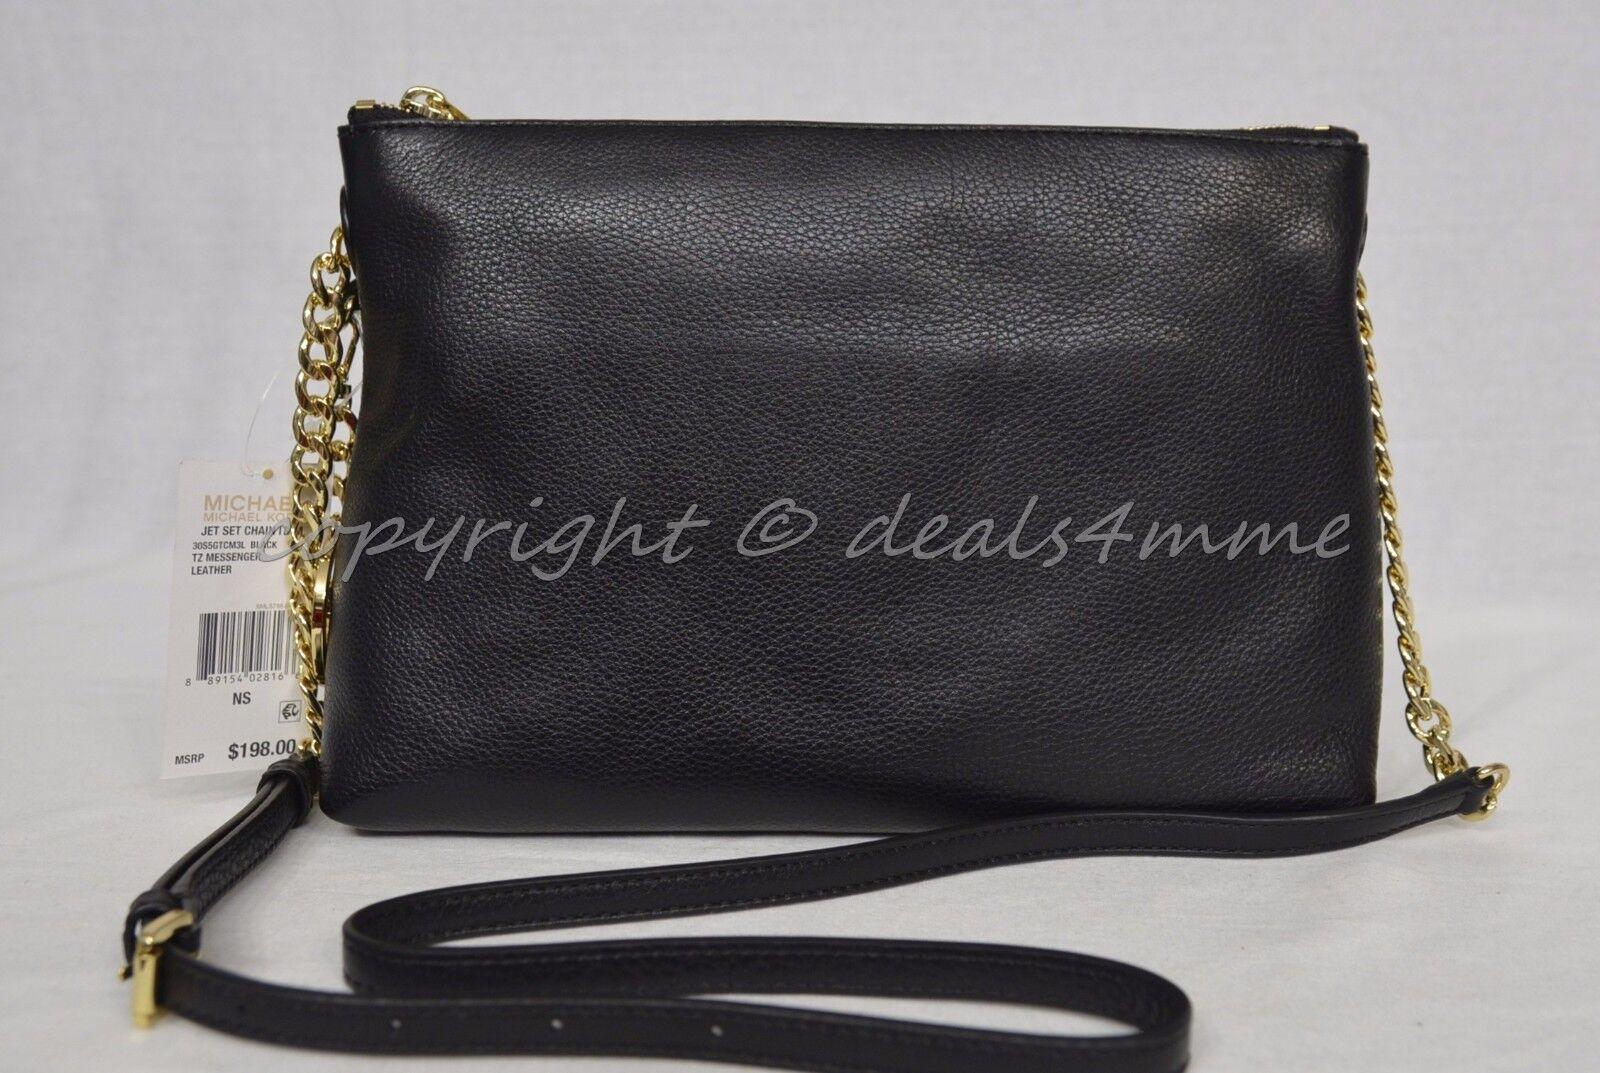 Michael Kors Jet Set Chain Item Black TZ Messenger Leather 30s5gtcm3l